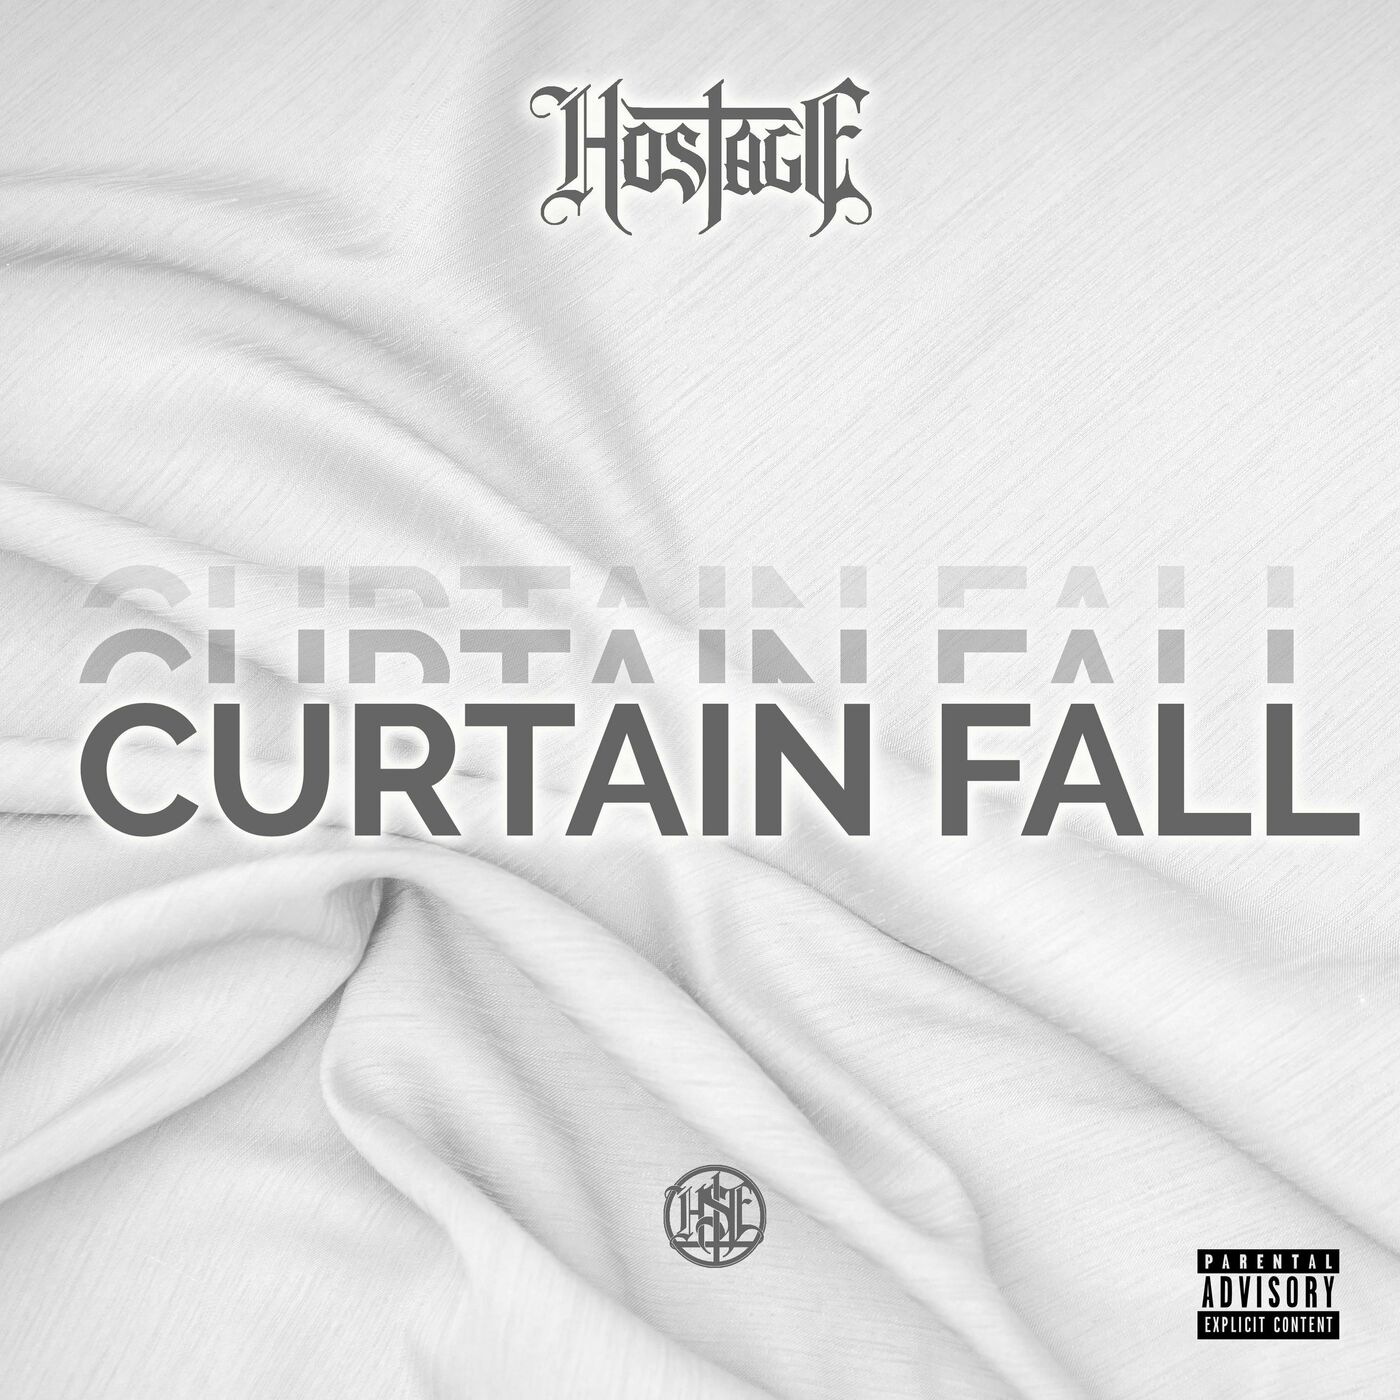 HOSTAGE - Curtain Fall [single] (2021)